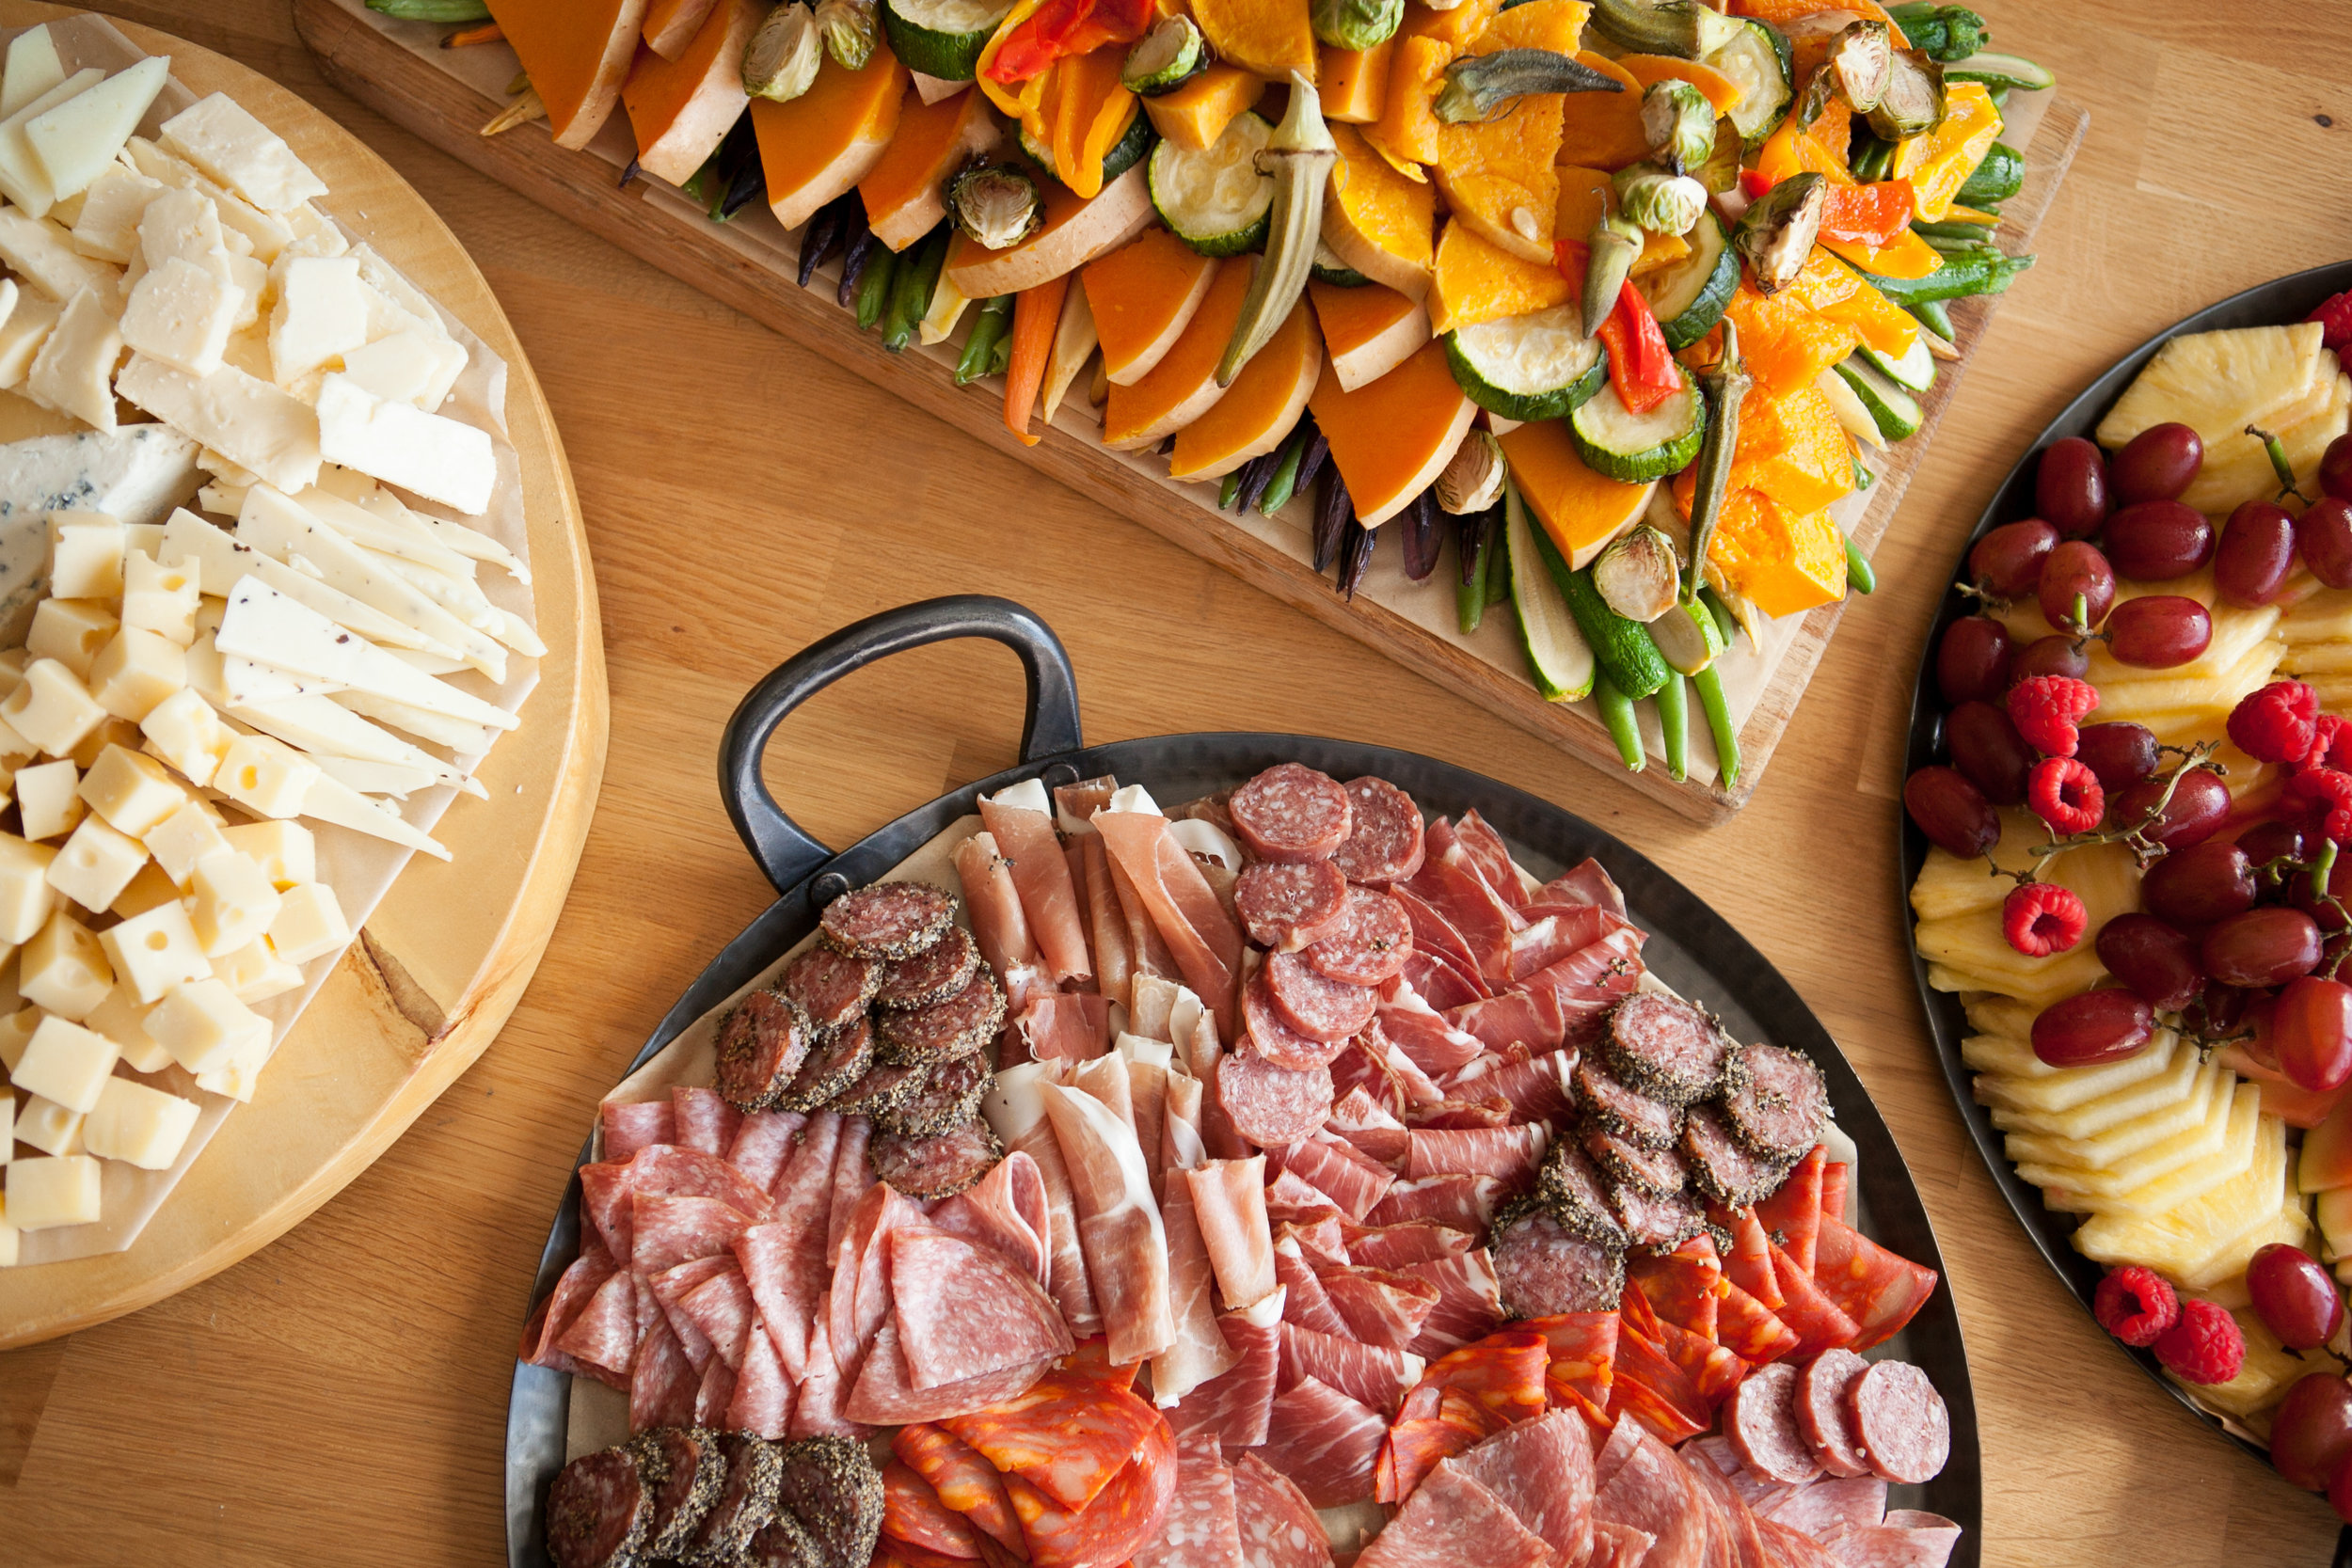 tampa-food-photographer-ablankplate-57.jpg